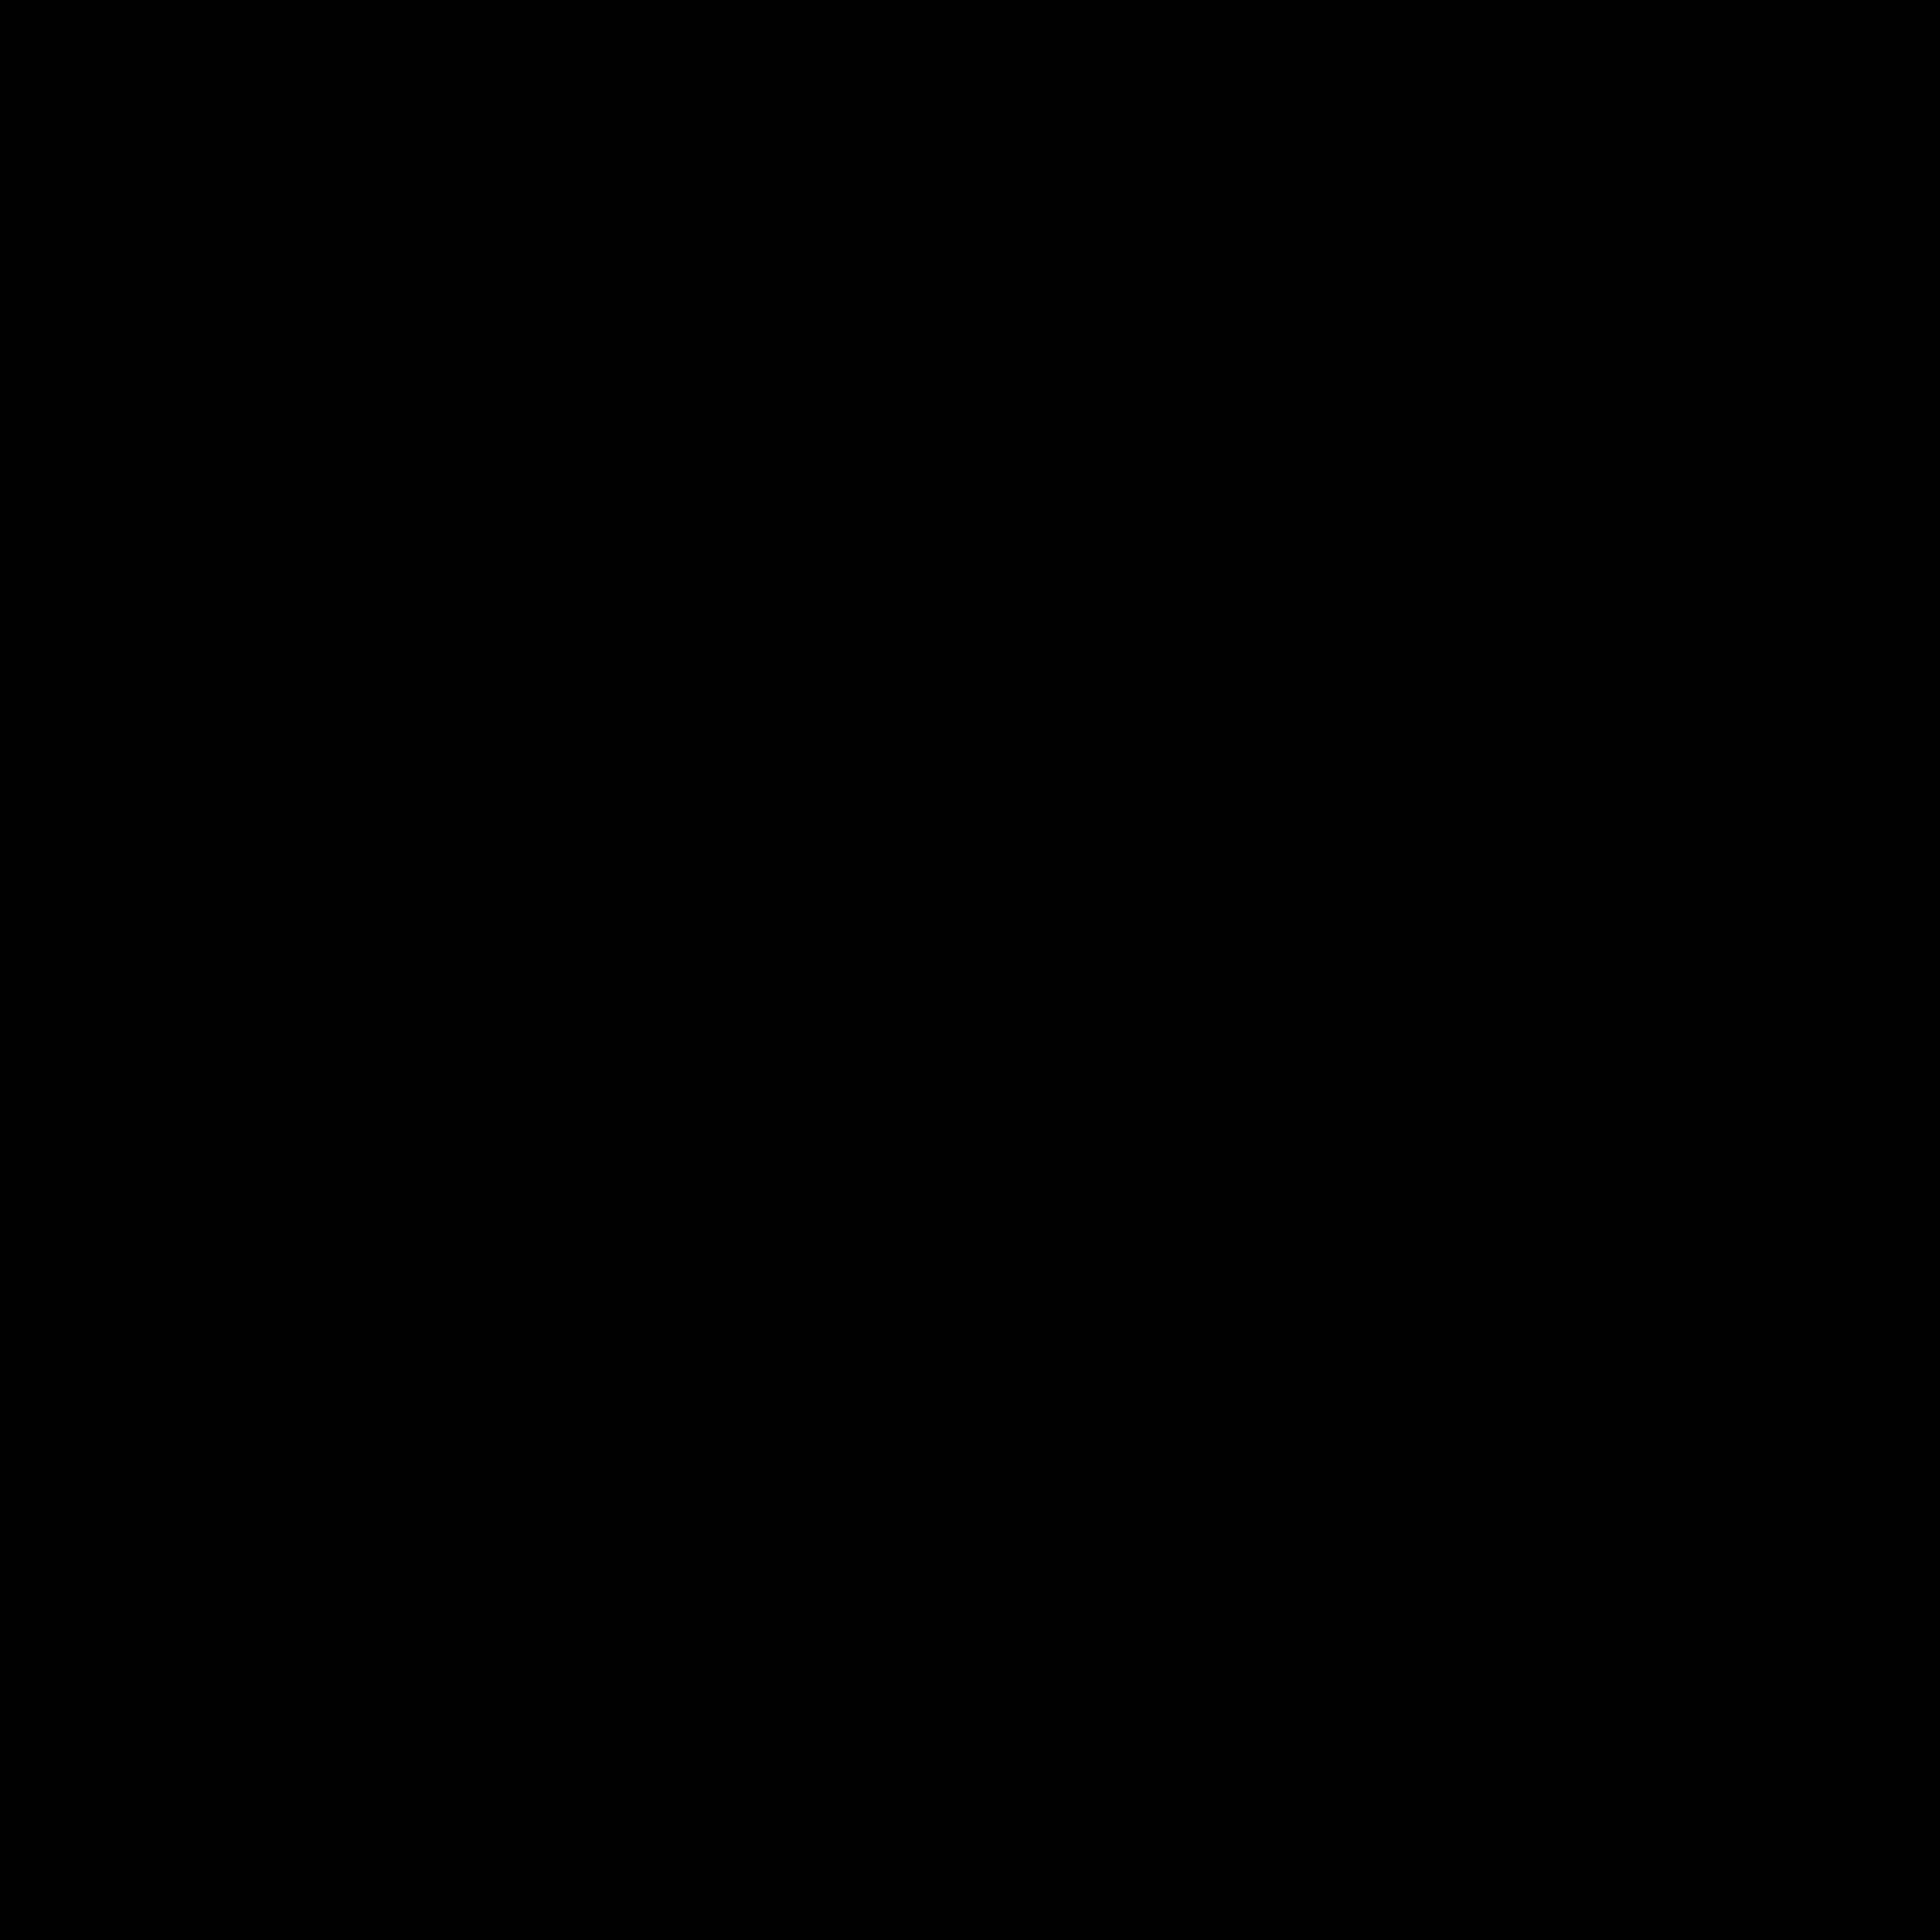 Guide Sil Tarp – Square  (10 x 10 ft / 3 x 3 m)